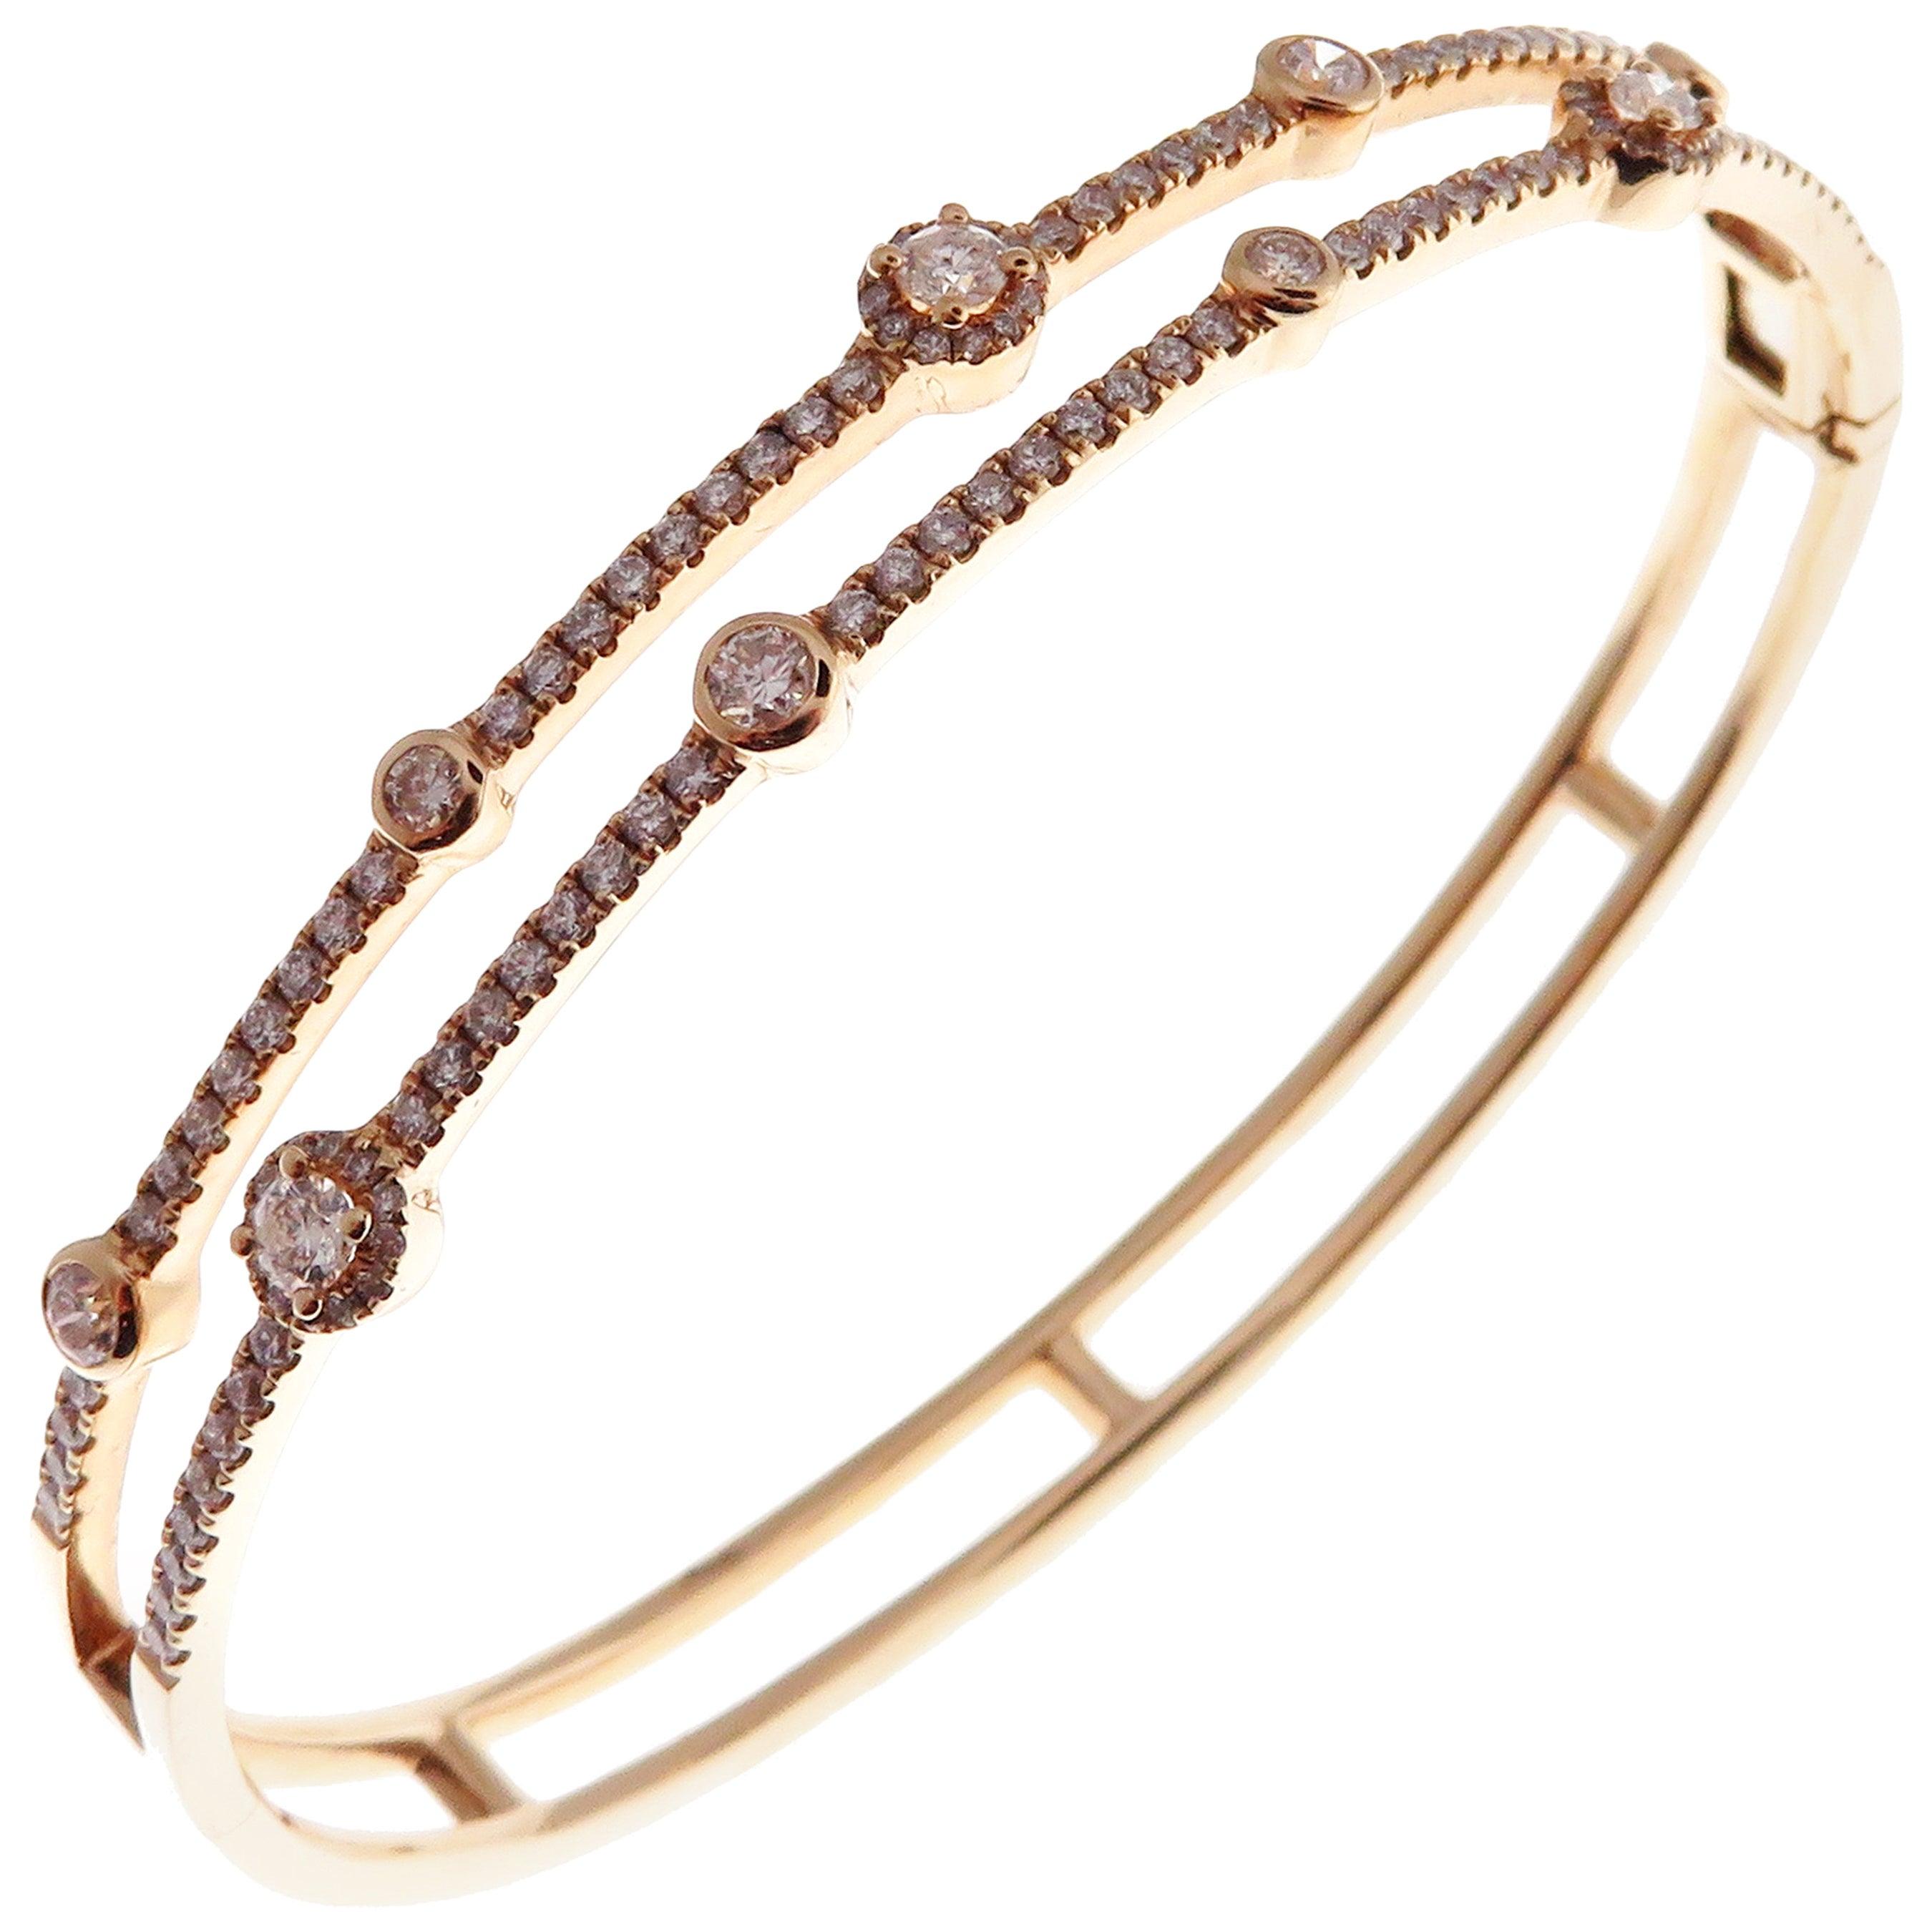 18 Karat Rose Gold Diamond Delicate Double Row Pave Bangle Bracelet